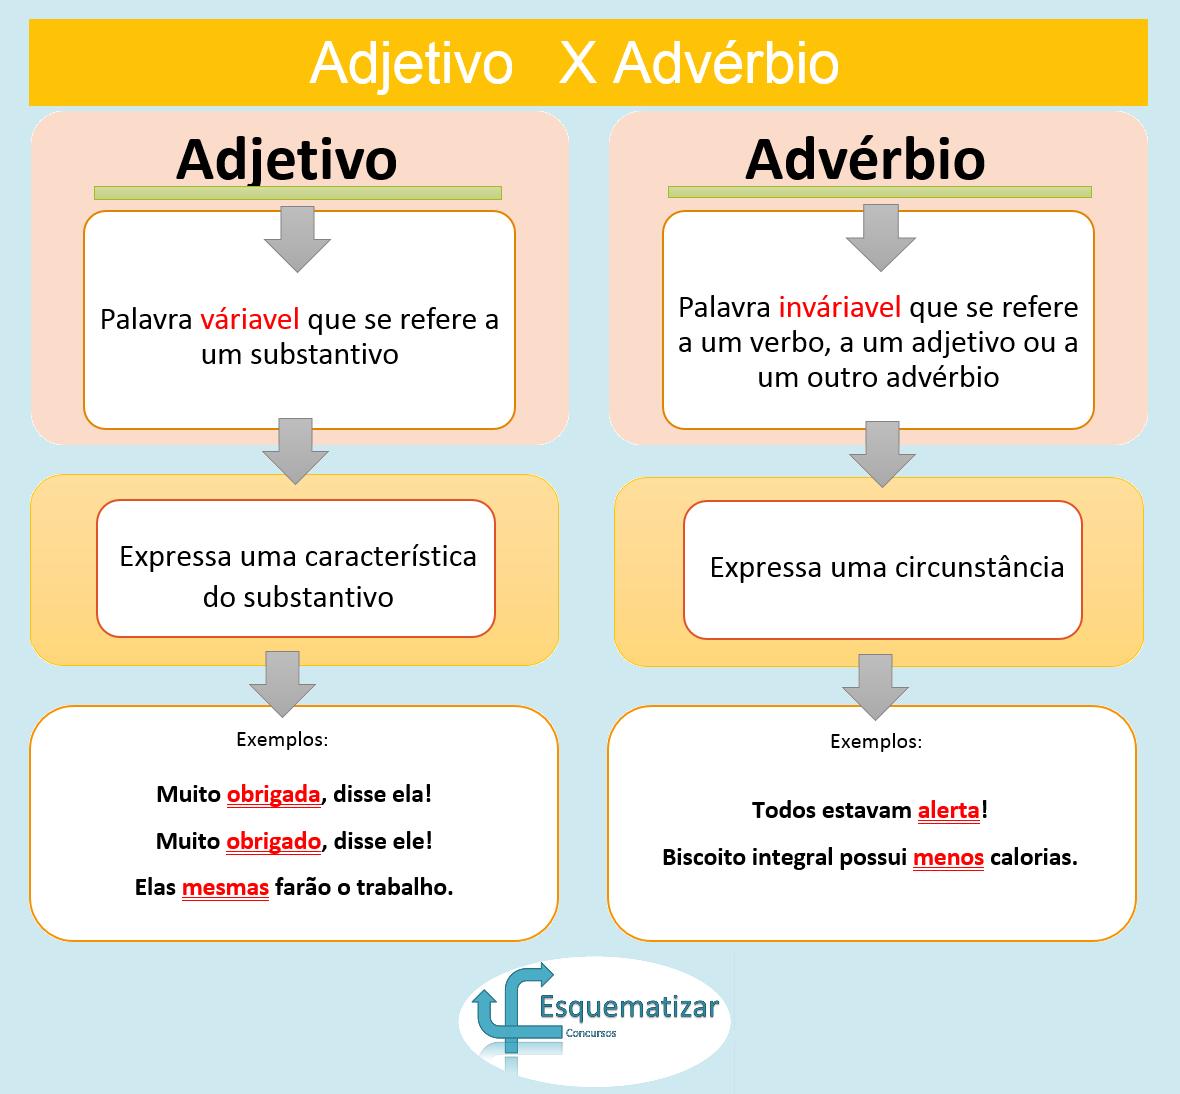 Adjetivo X Advérbio